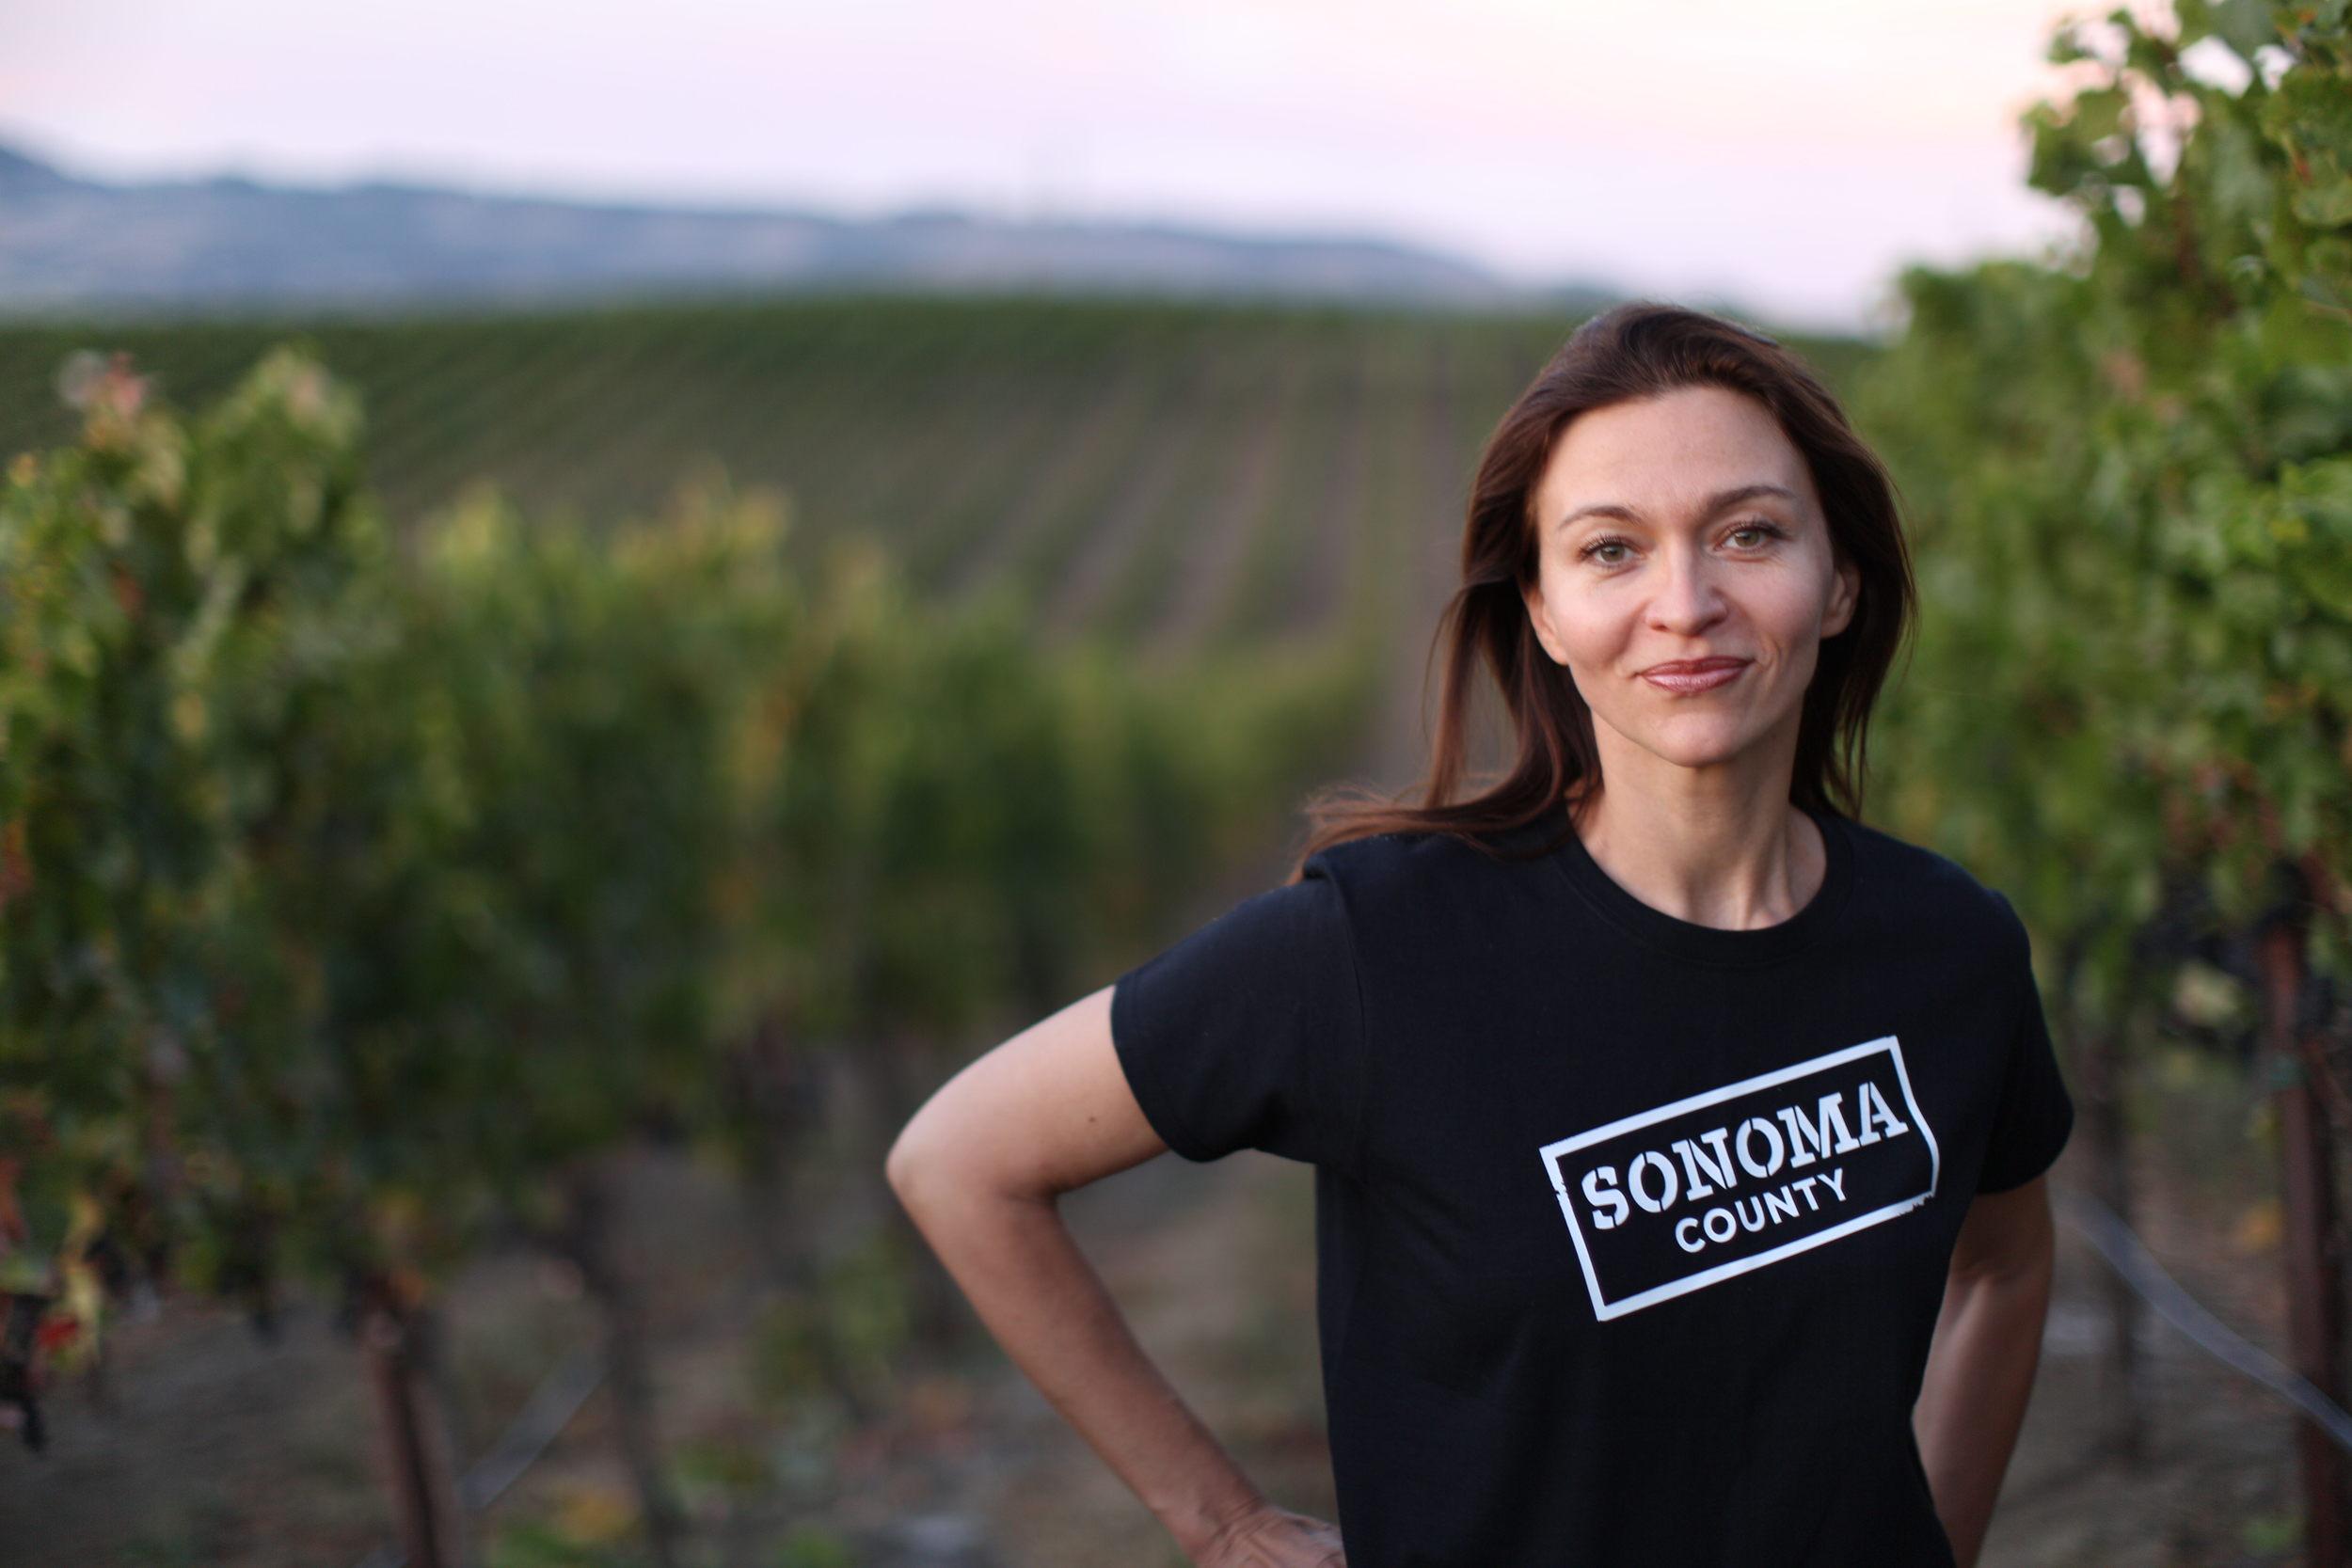 Diana Karren, owner of Terra de Promissio and Land of Promise Wine